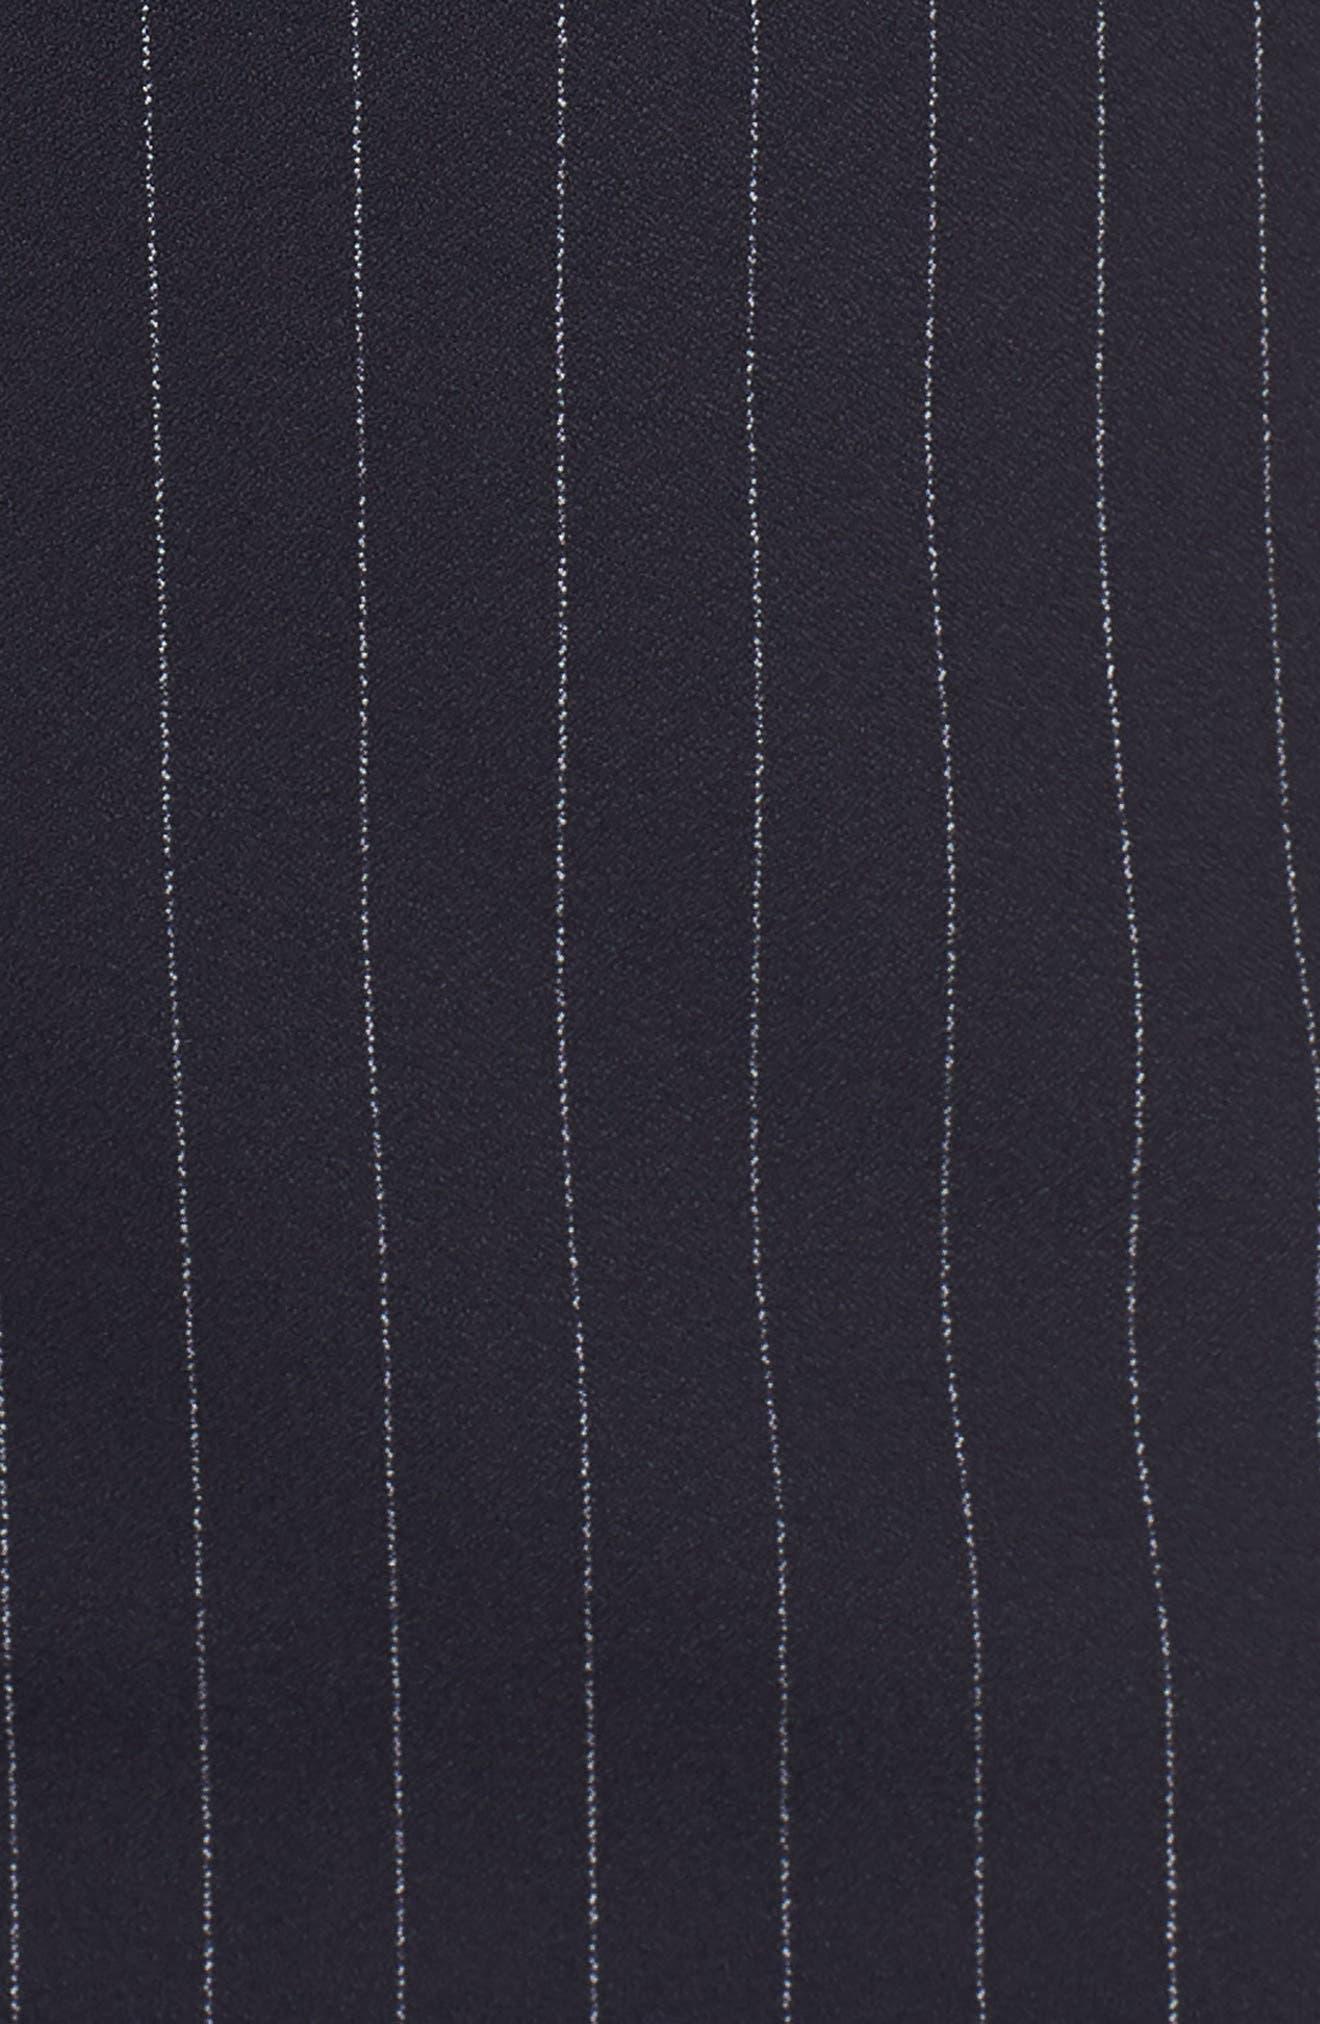 Dalayara Pinstripe Sheath Dress,                             Alternate thumbnail 5, color,                             Navy Fantasy